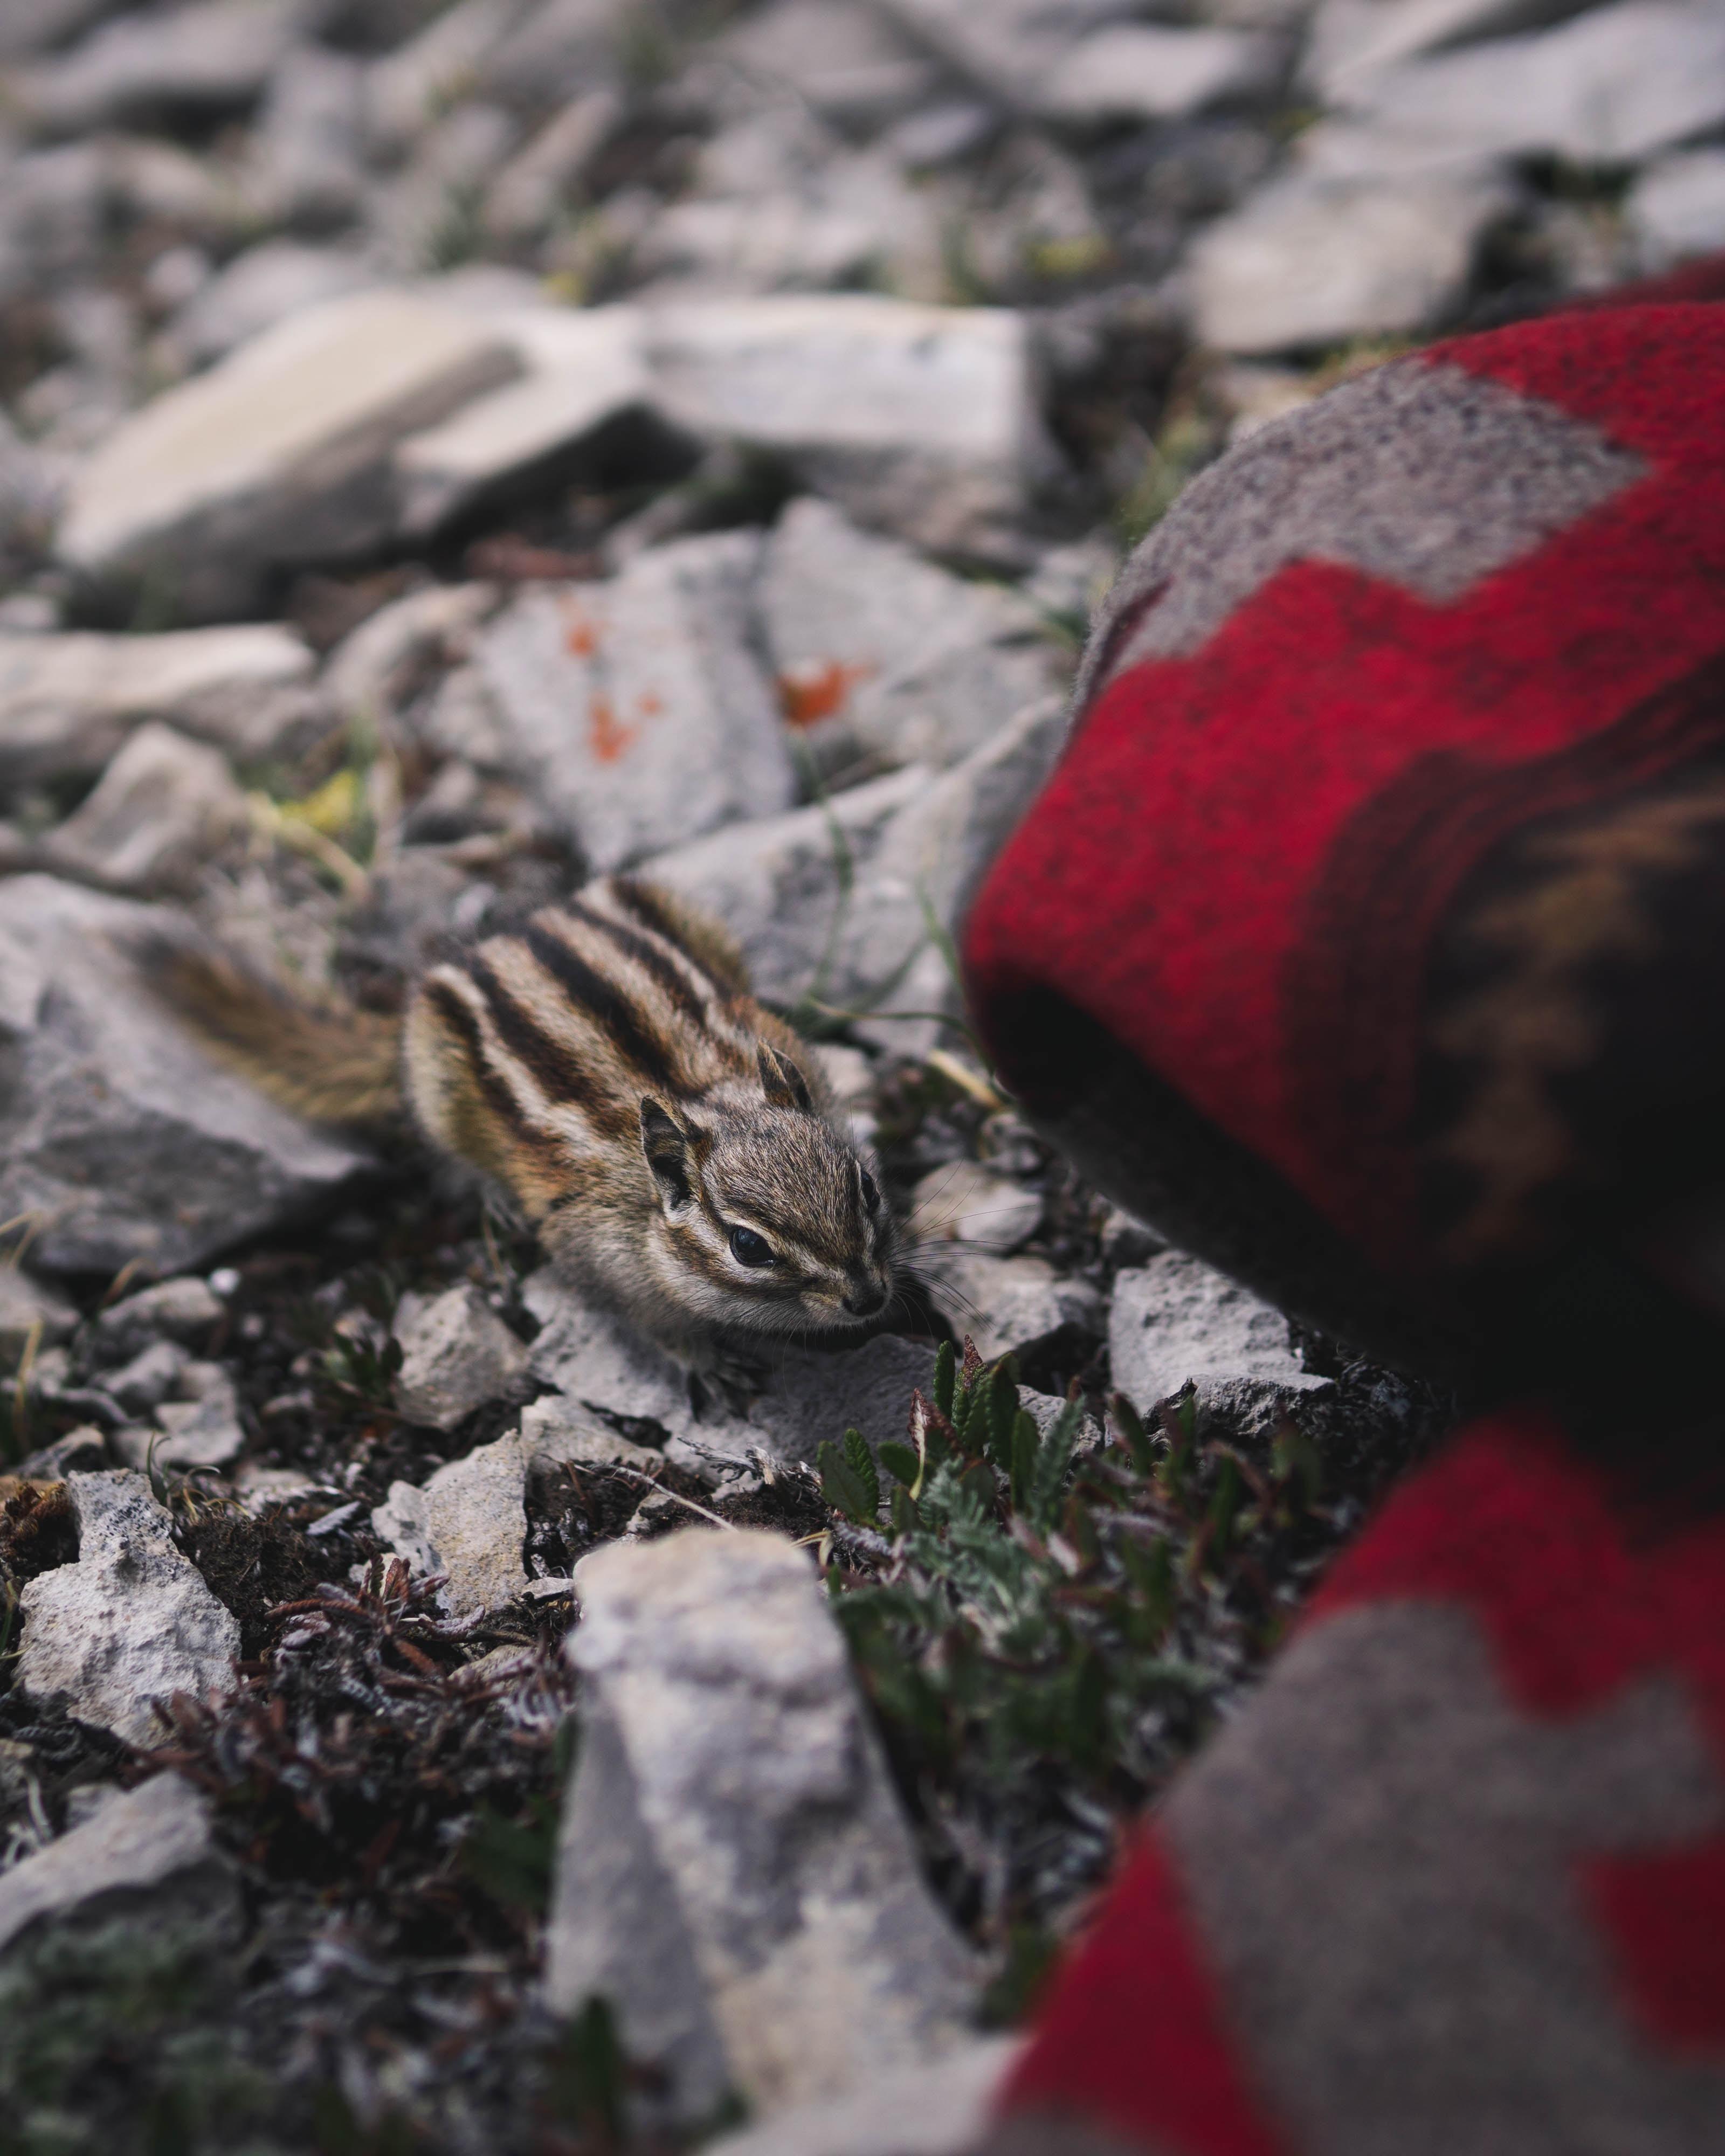 closeup photo of chipmunk on gray stone